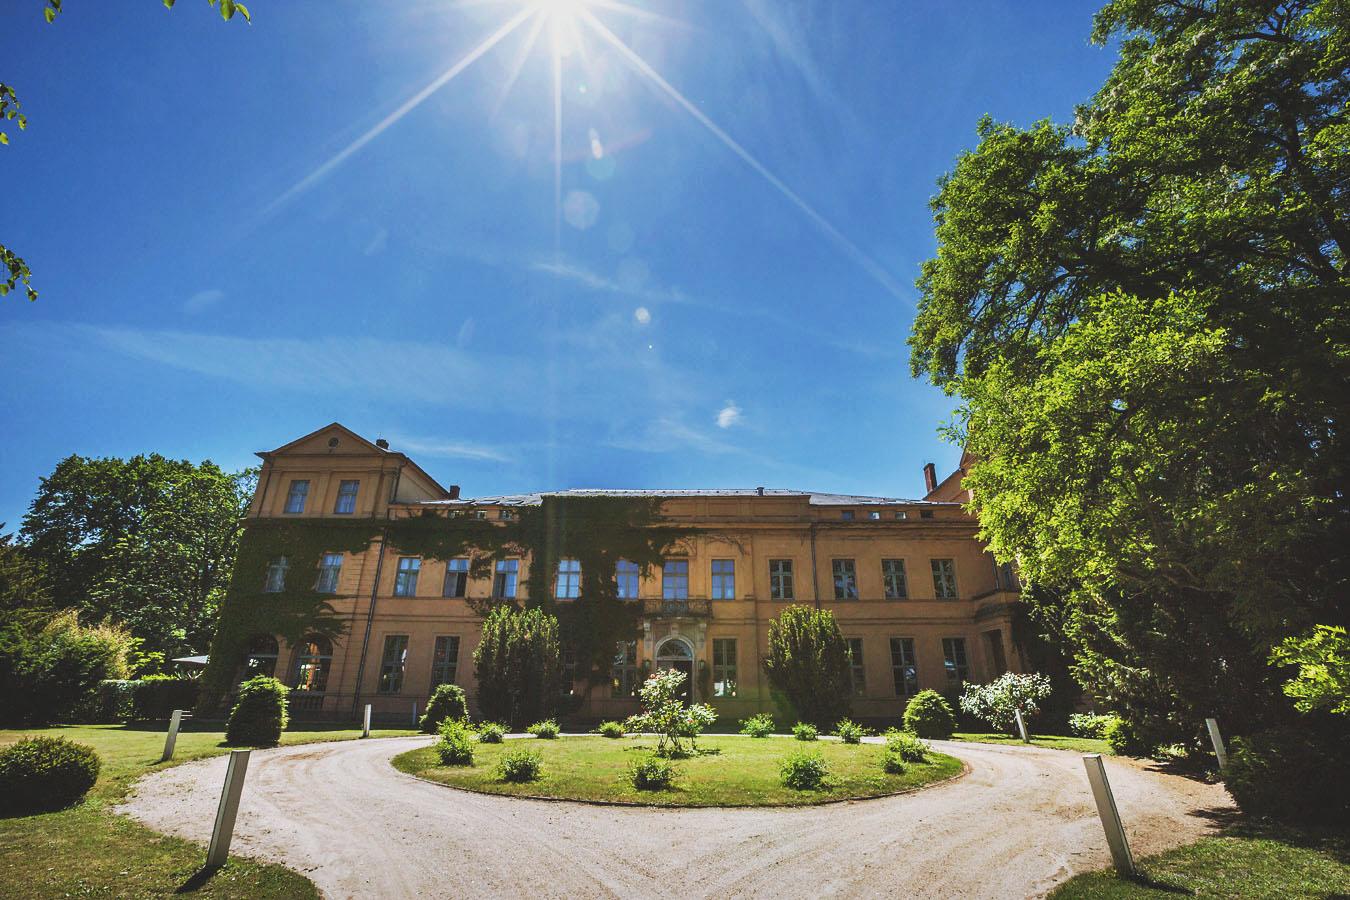 Hochzeitsfotograf Schloss Ziethen